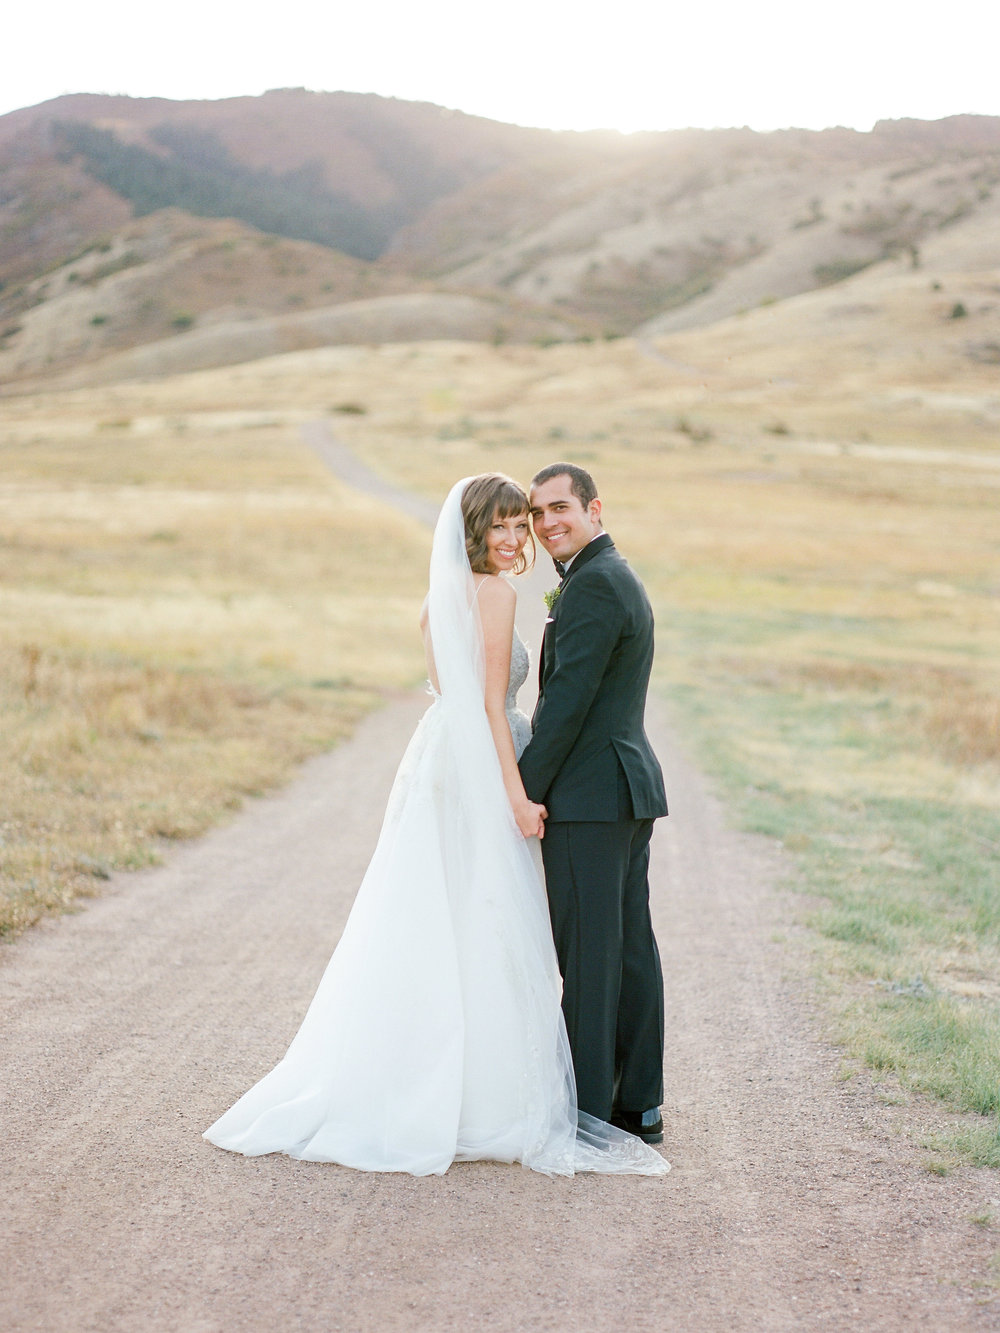 madeline-roberto-wedding-bride-groom-90.jpg